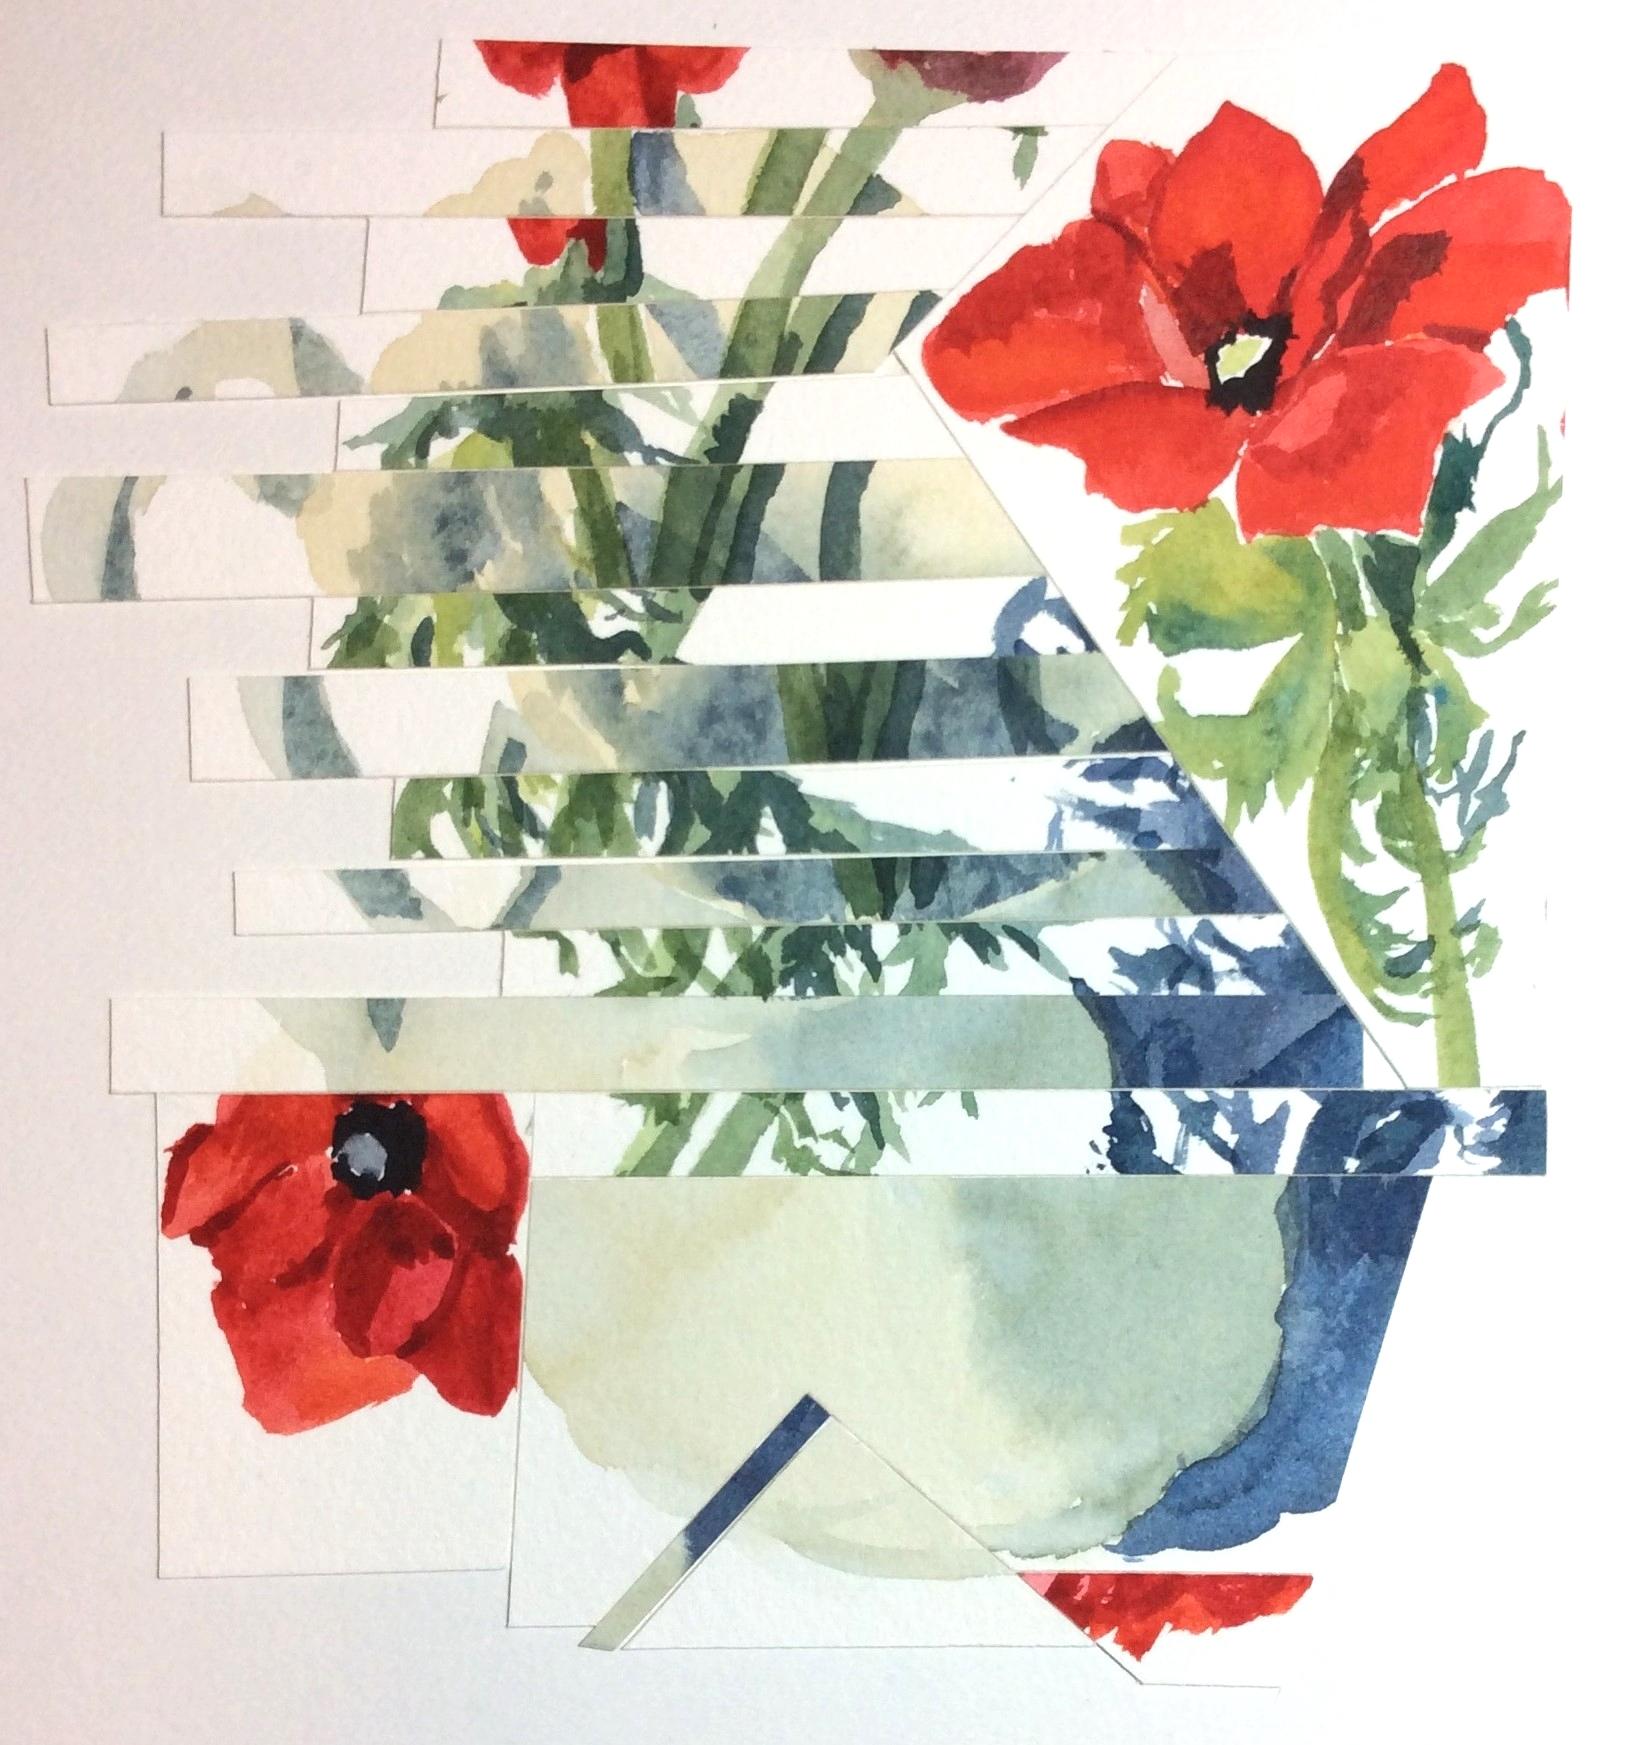 """Poppycock"" Art journal, watercolour collage, 7.5 x 8"""